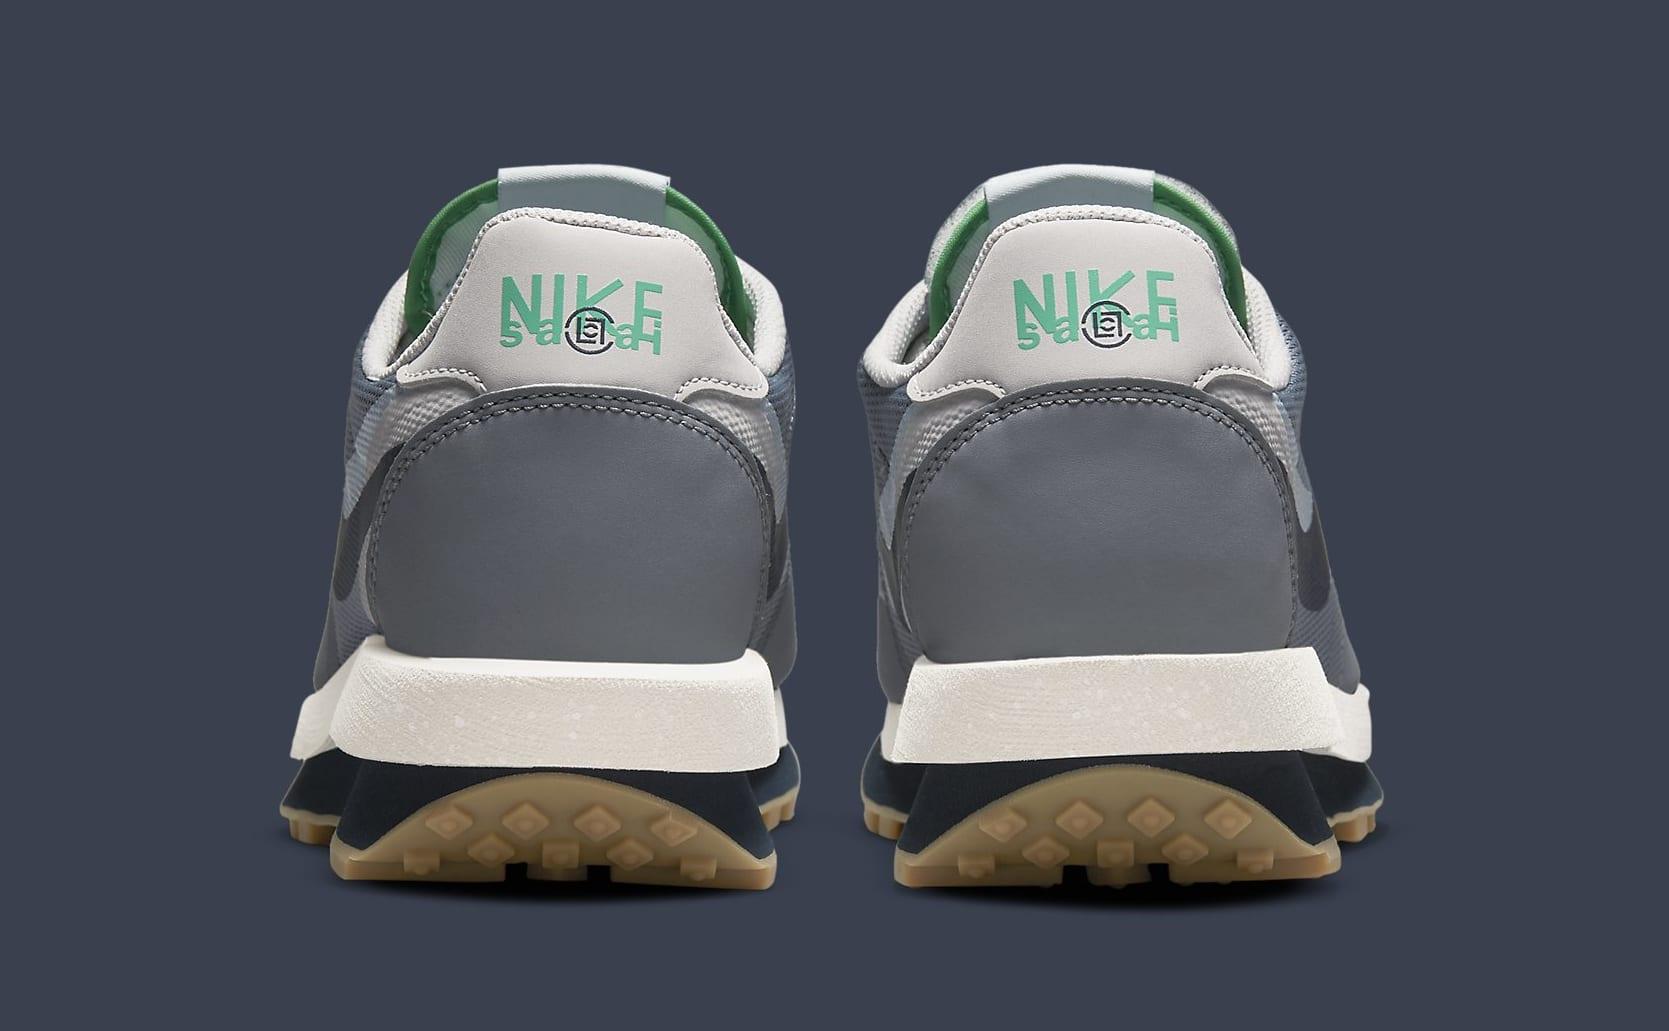 Clot x Sacai x Nike LDWaffle 'Cool Grey' DH3114-001 Heel